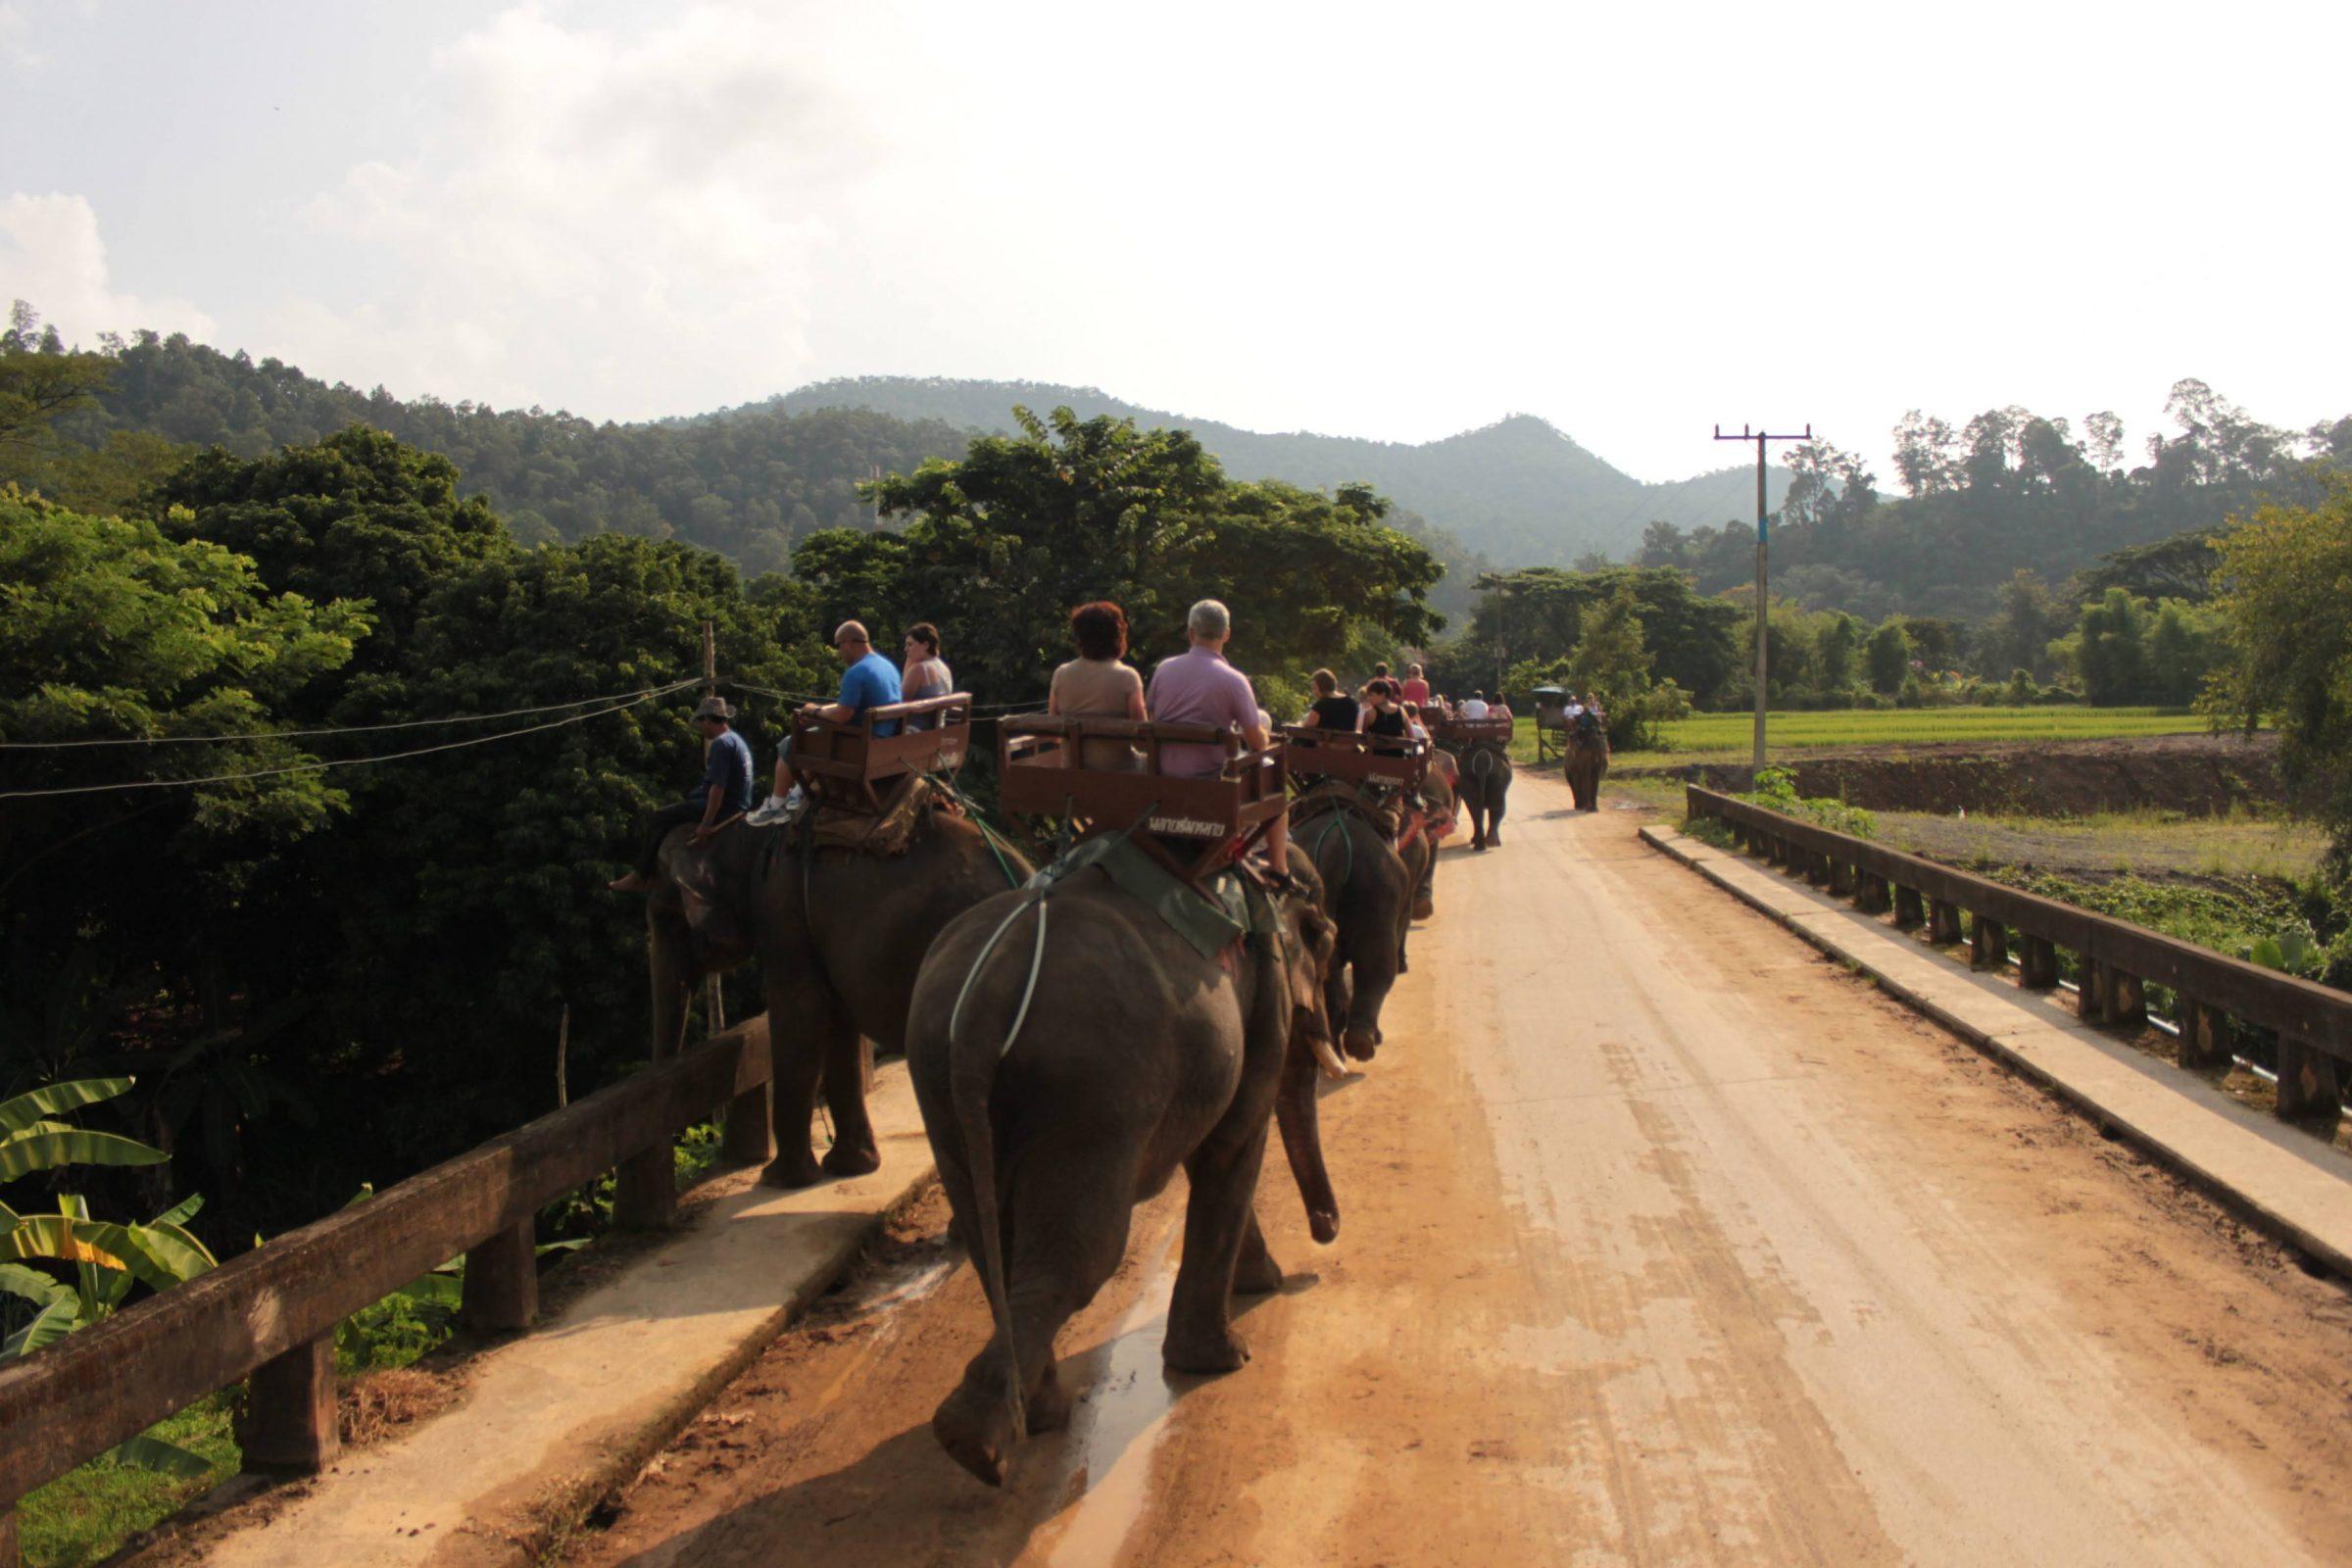 Olifantenrit in Chiang Mai, Thailand